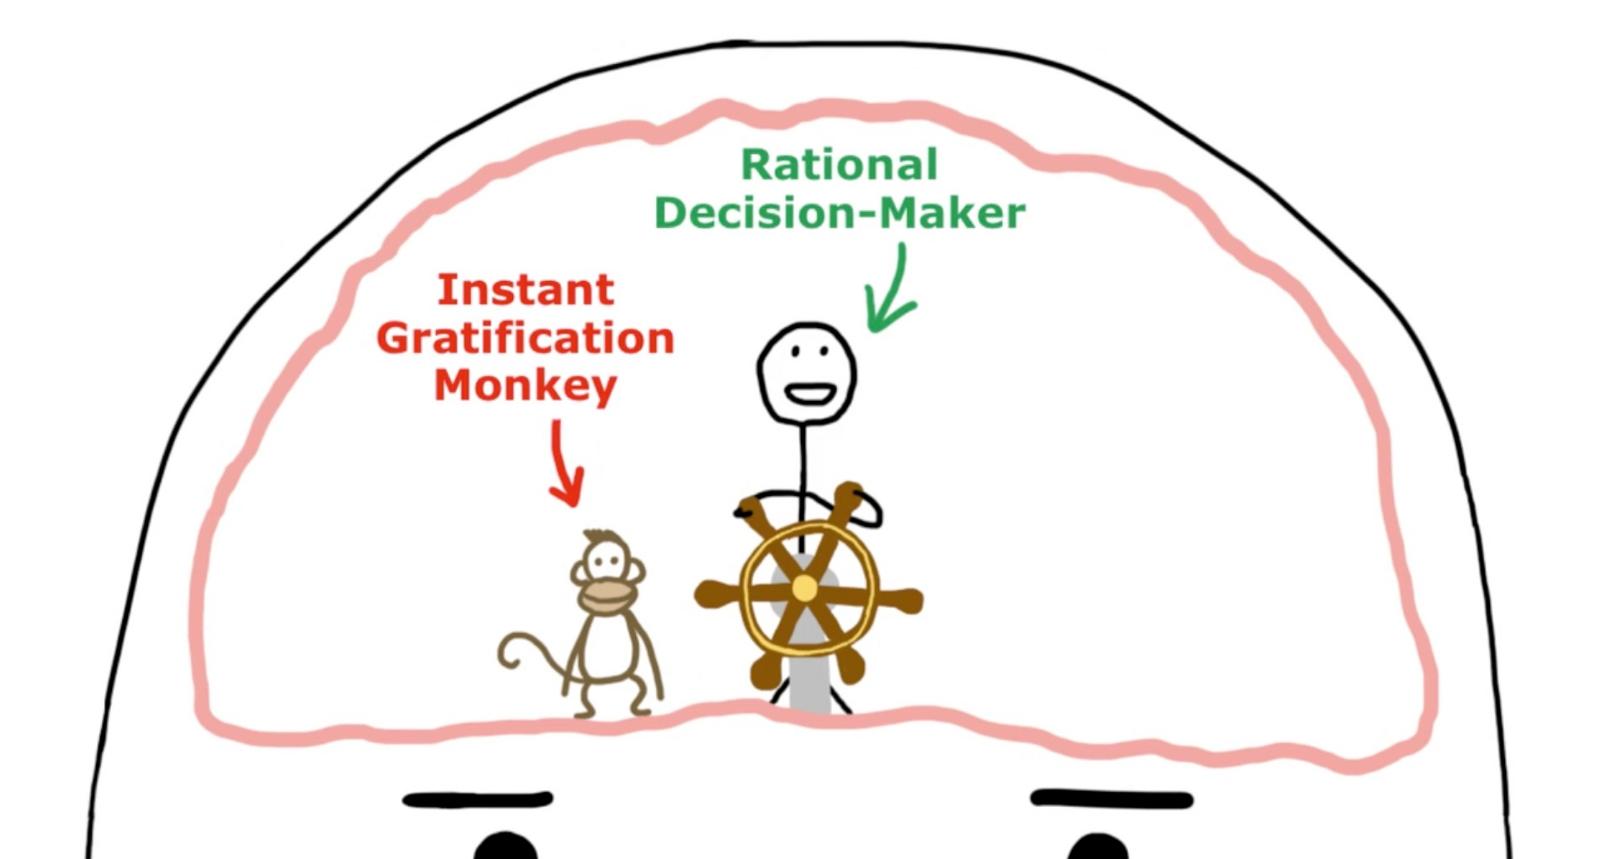 Instant-Gratitification-Monkey.6ecd5da983524d91a938662dc49cde00.png